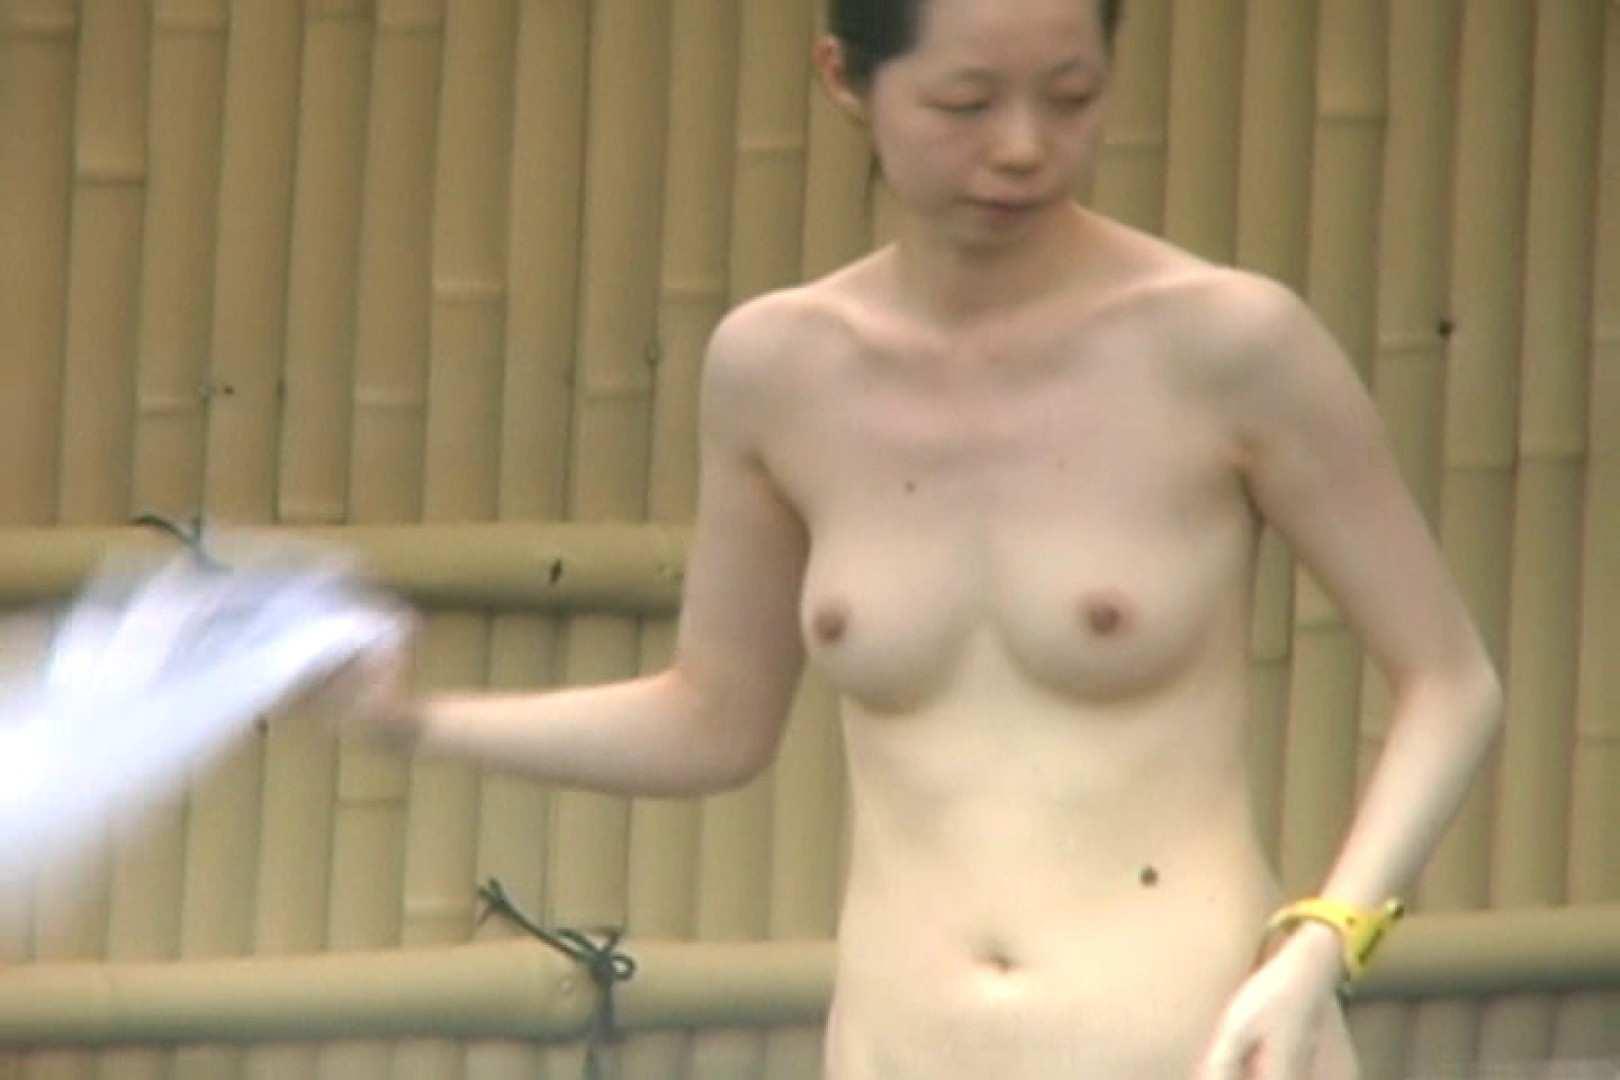 Aquaな露天風呂Vol.565 OLすけべ画像 おめこ無修正動画無料 52連発 17